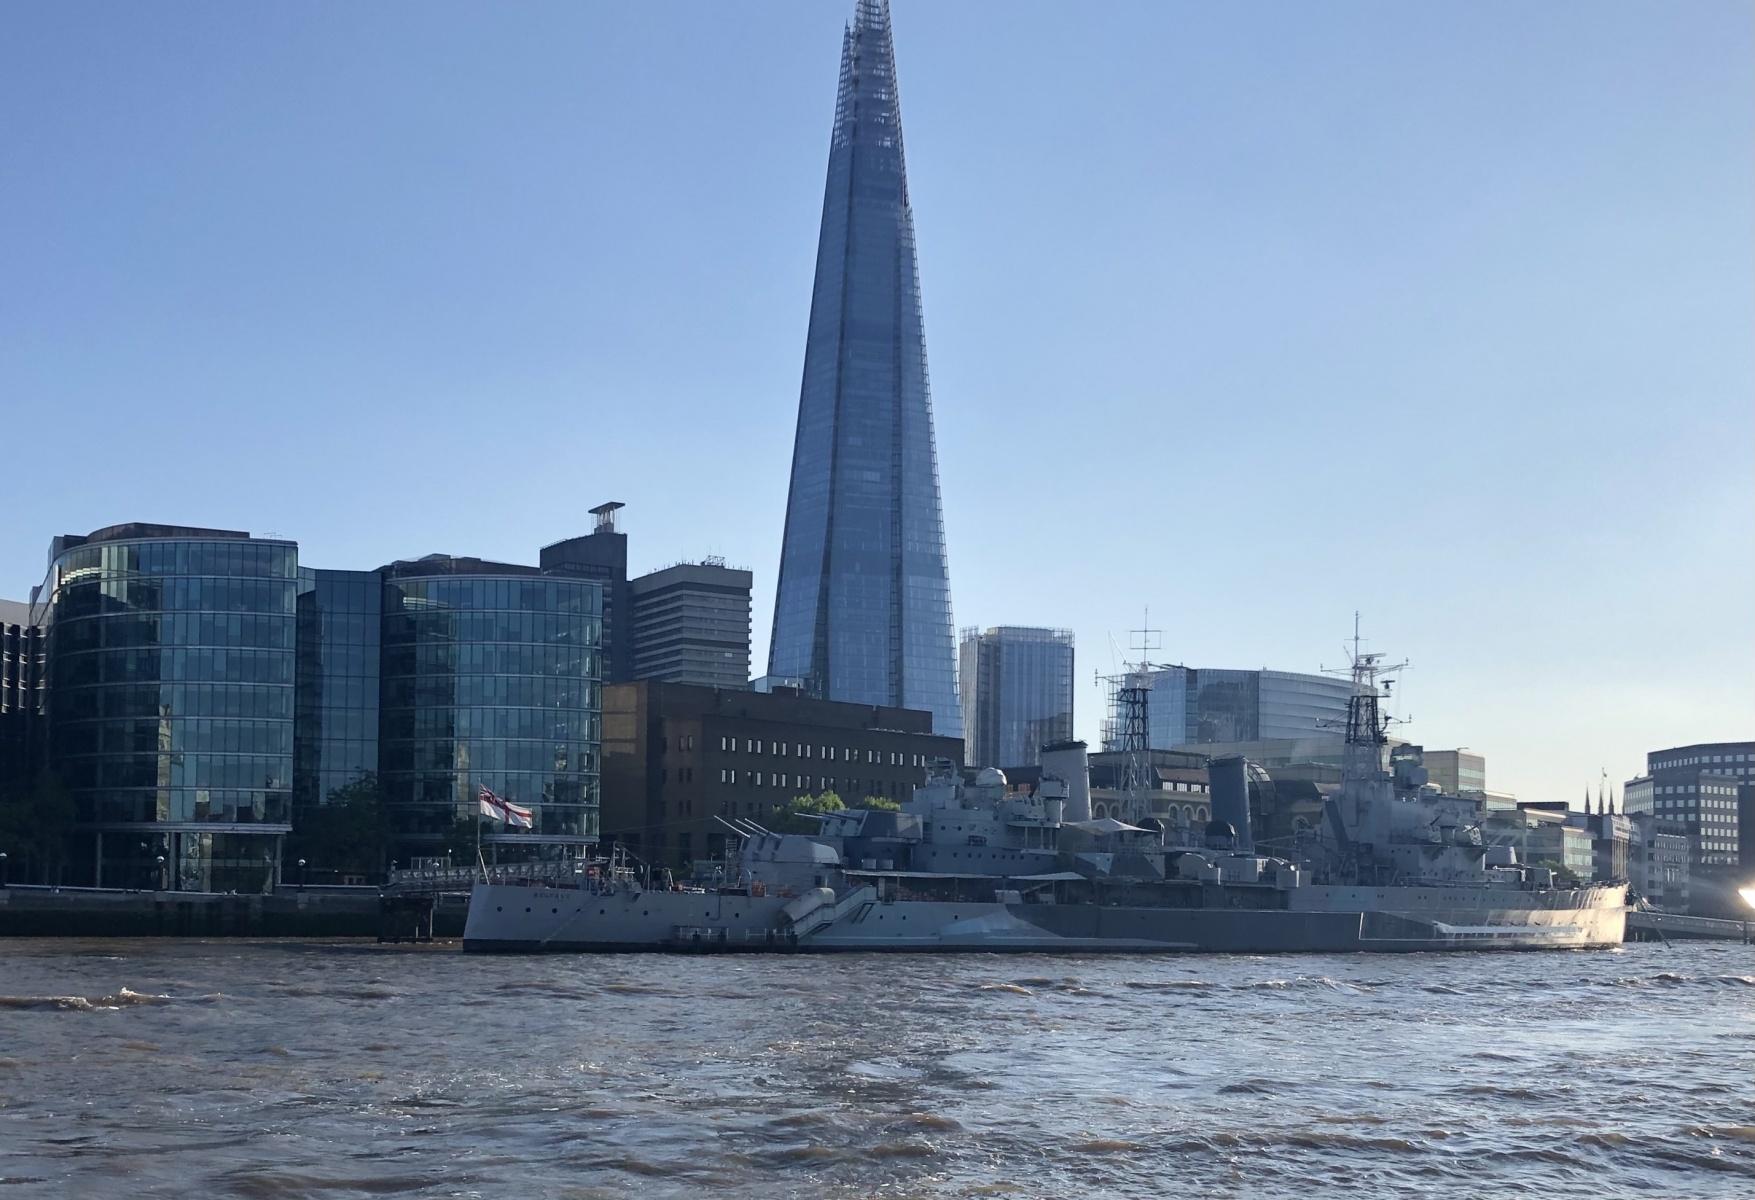 The-Shard-HMS-Belfast